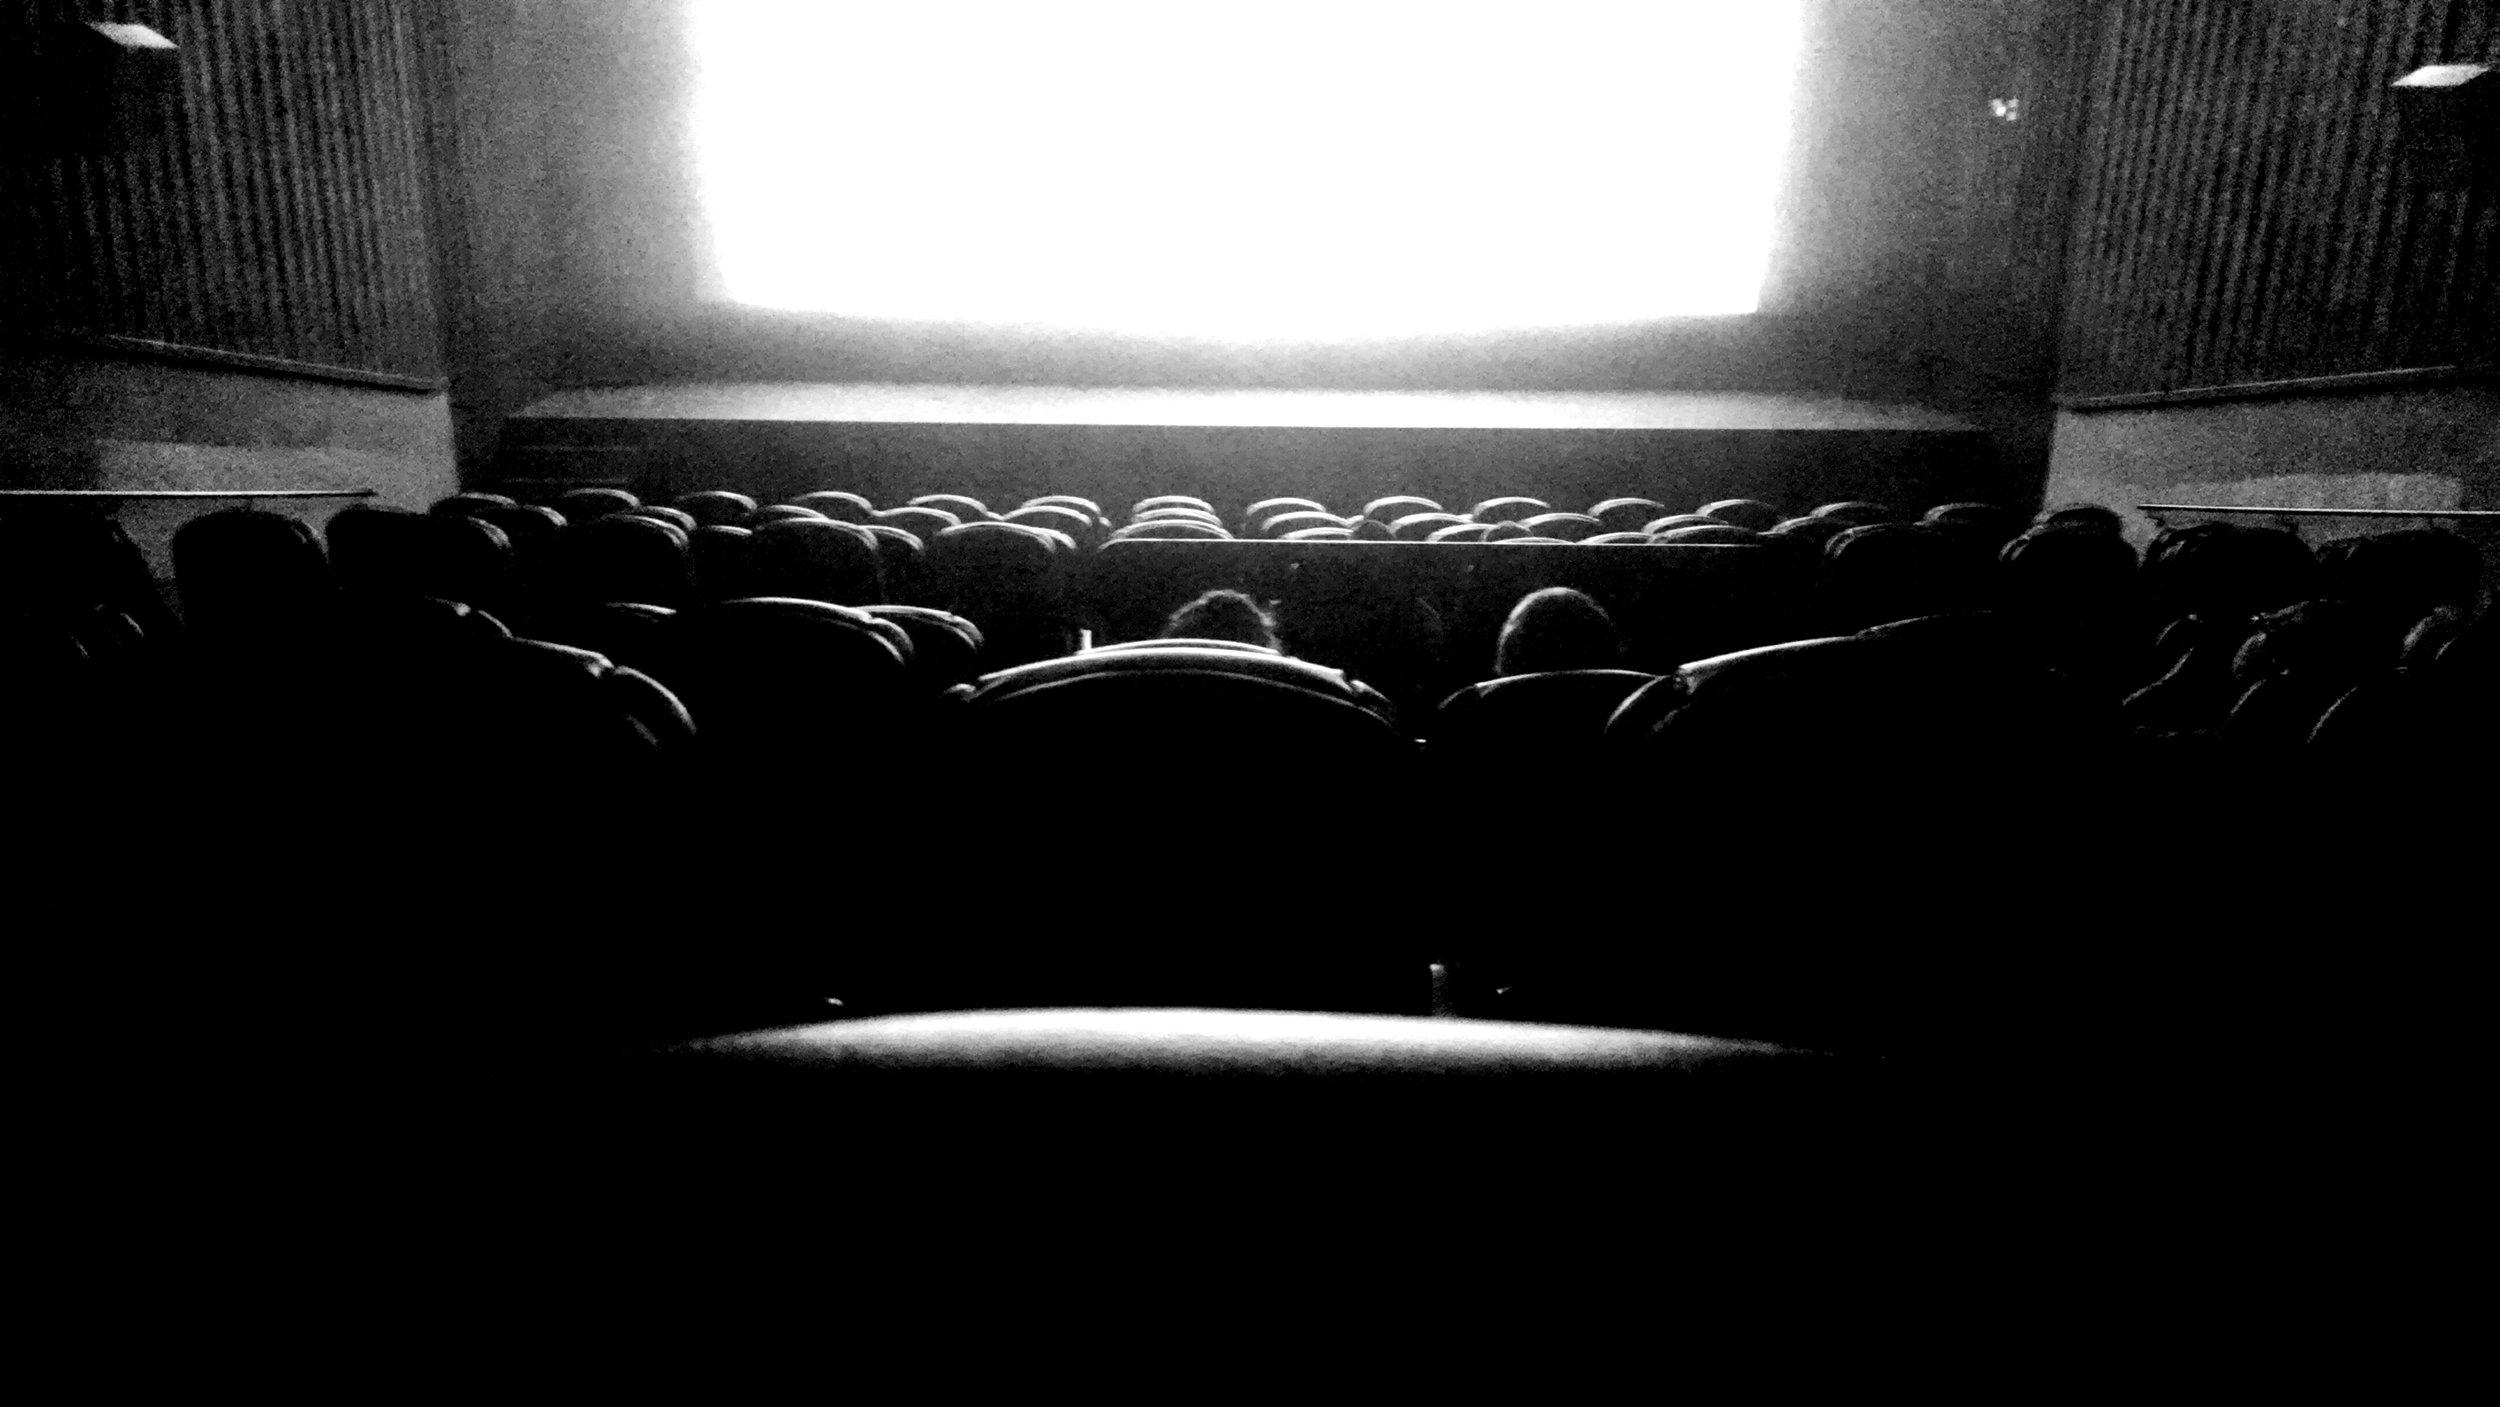 movie-screen-theater-79812.jpg